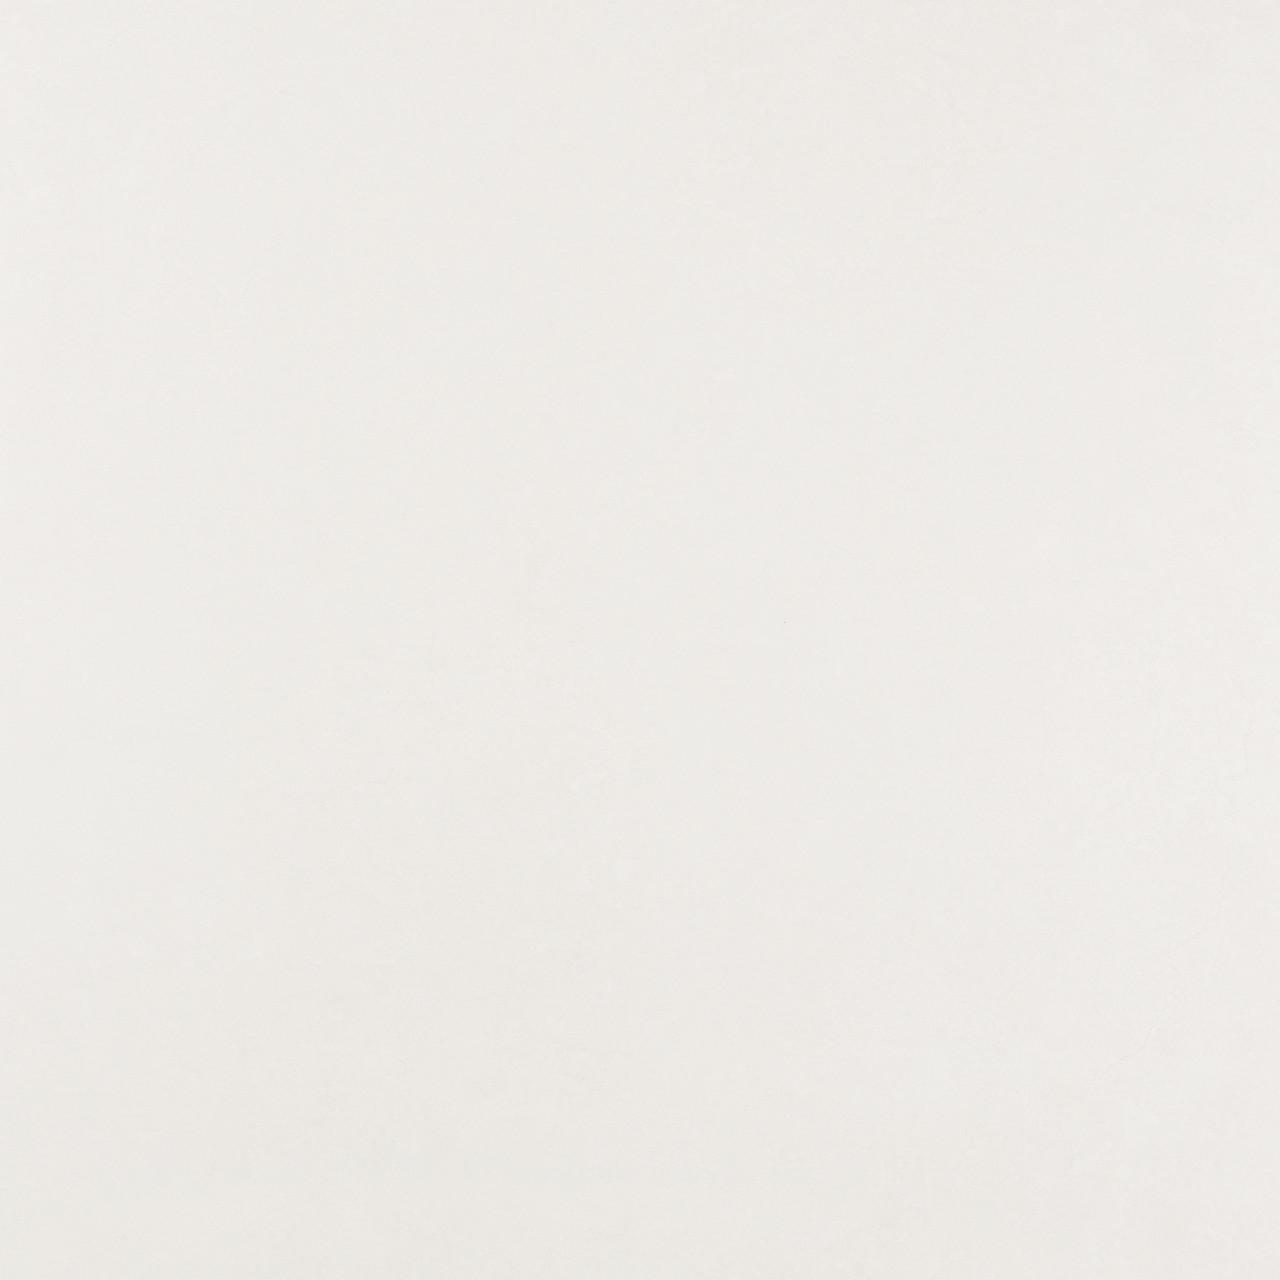 Плитка для пола ГРЕС 900x900x10,5 PK Arc W сорт S